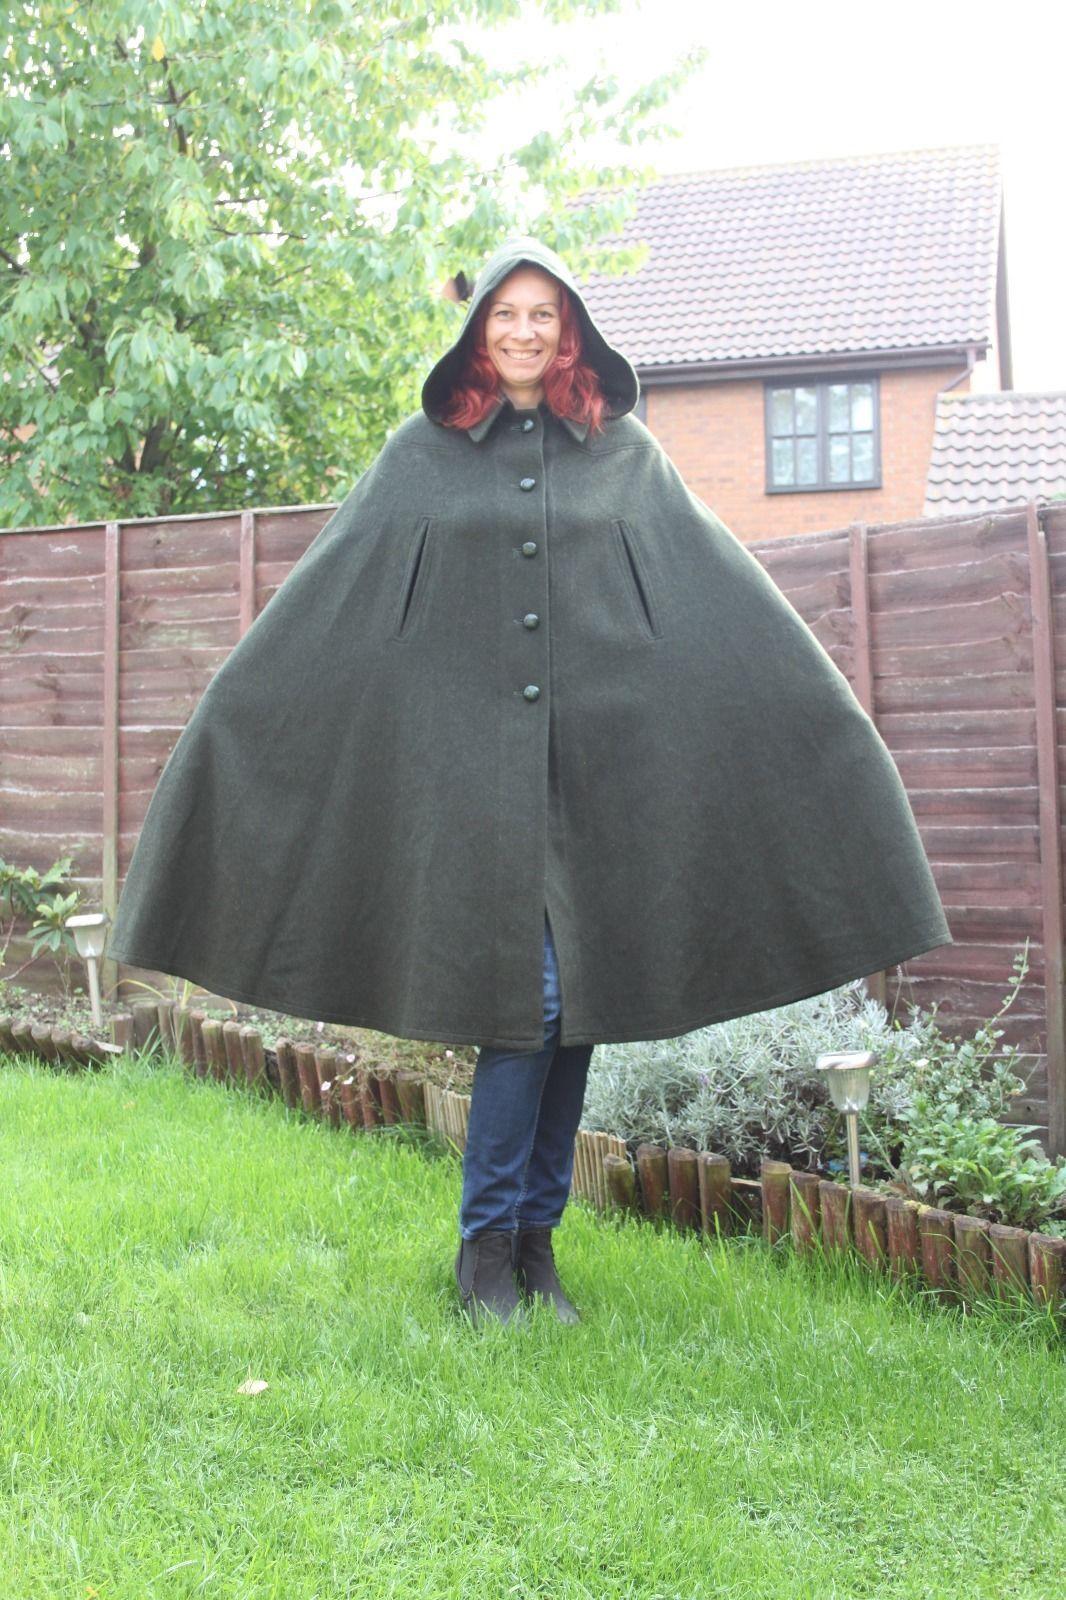 oberrauch zitt vintage italian women 39 s wool loden cape hooded green cloak. Black Bedroom Furniture Sets. Home Design Ideas